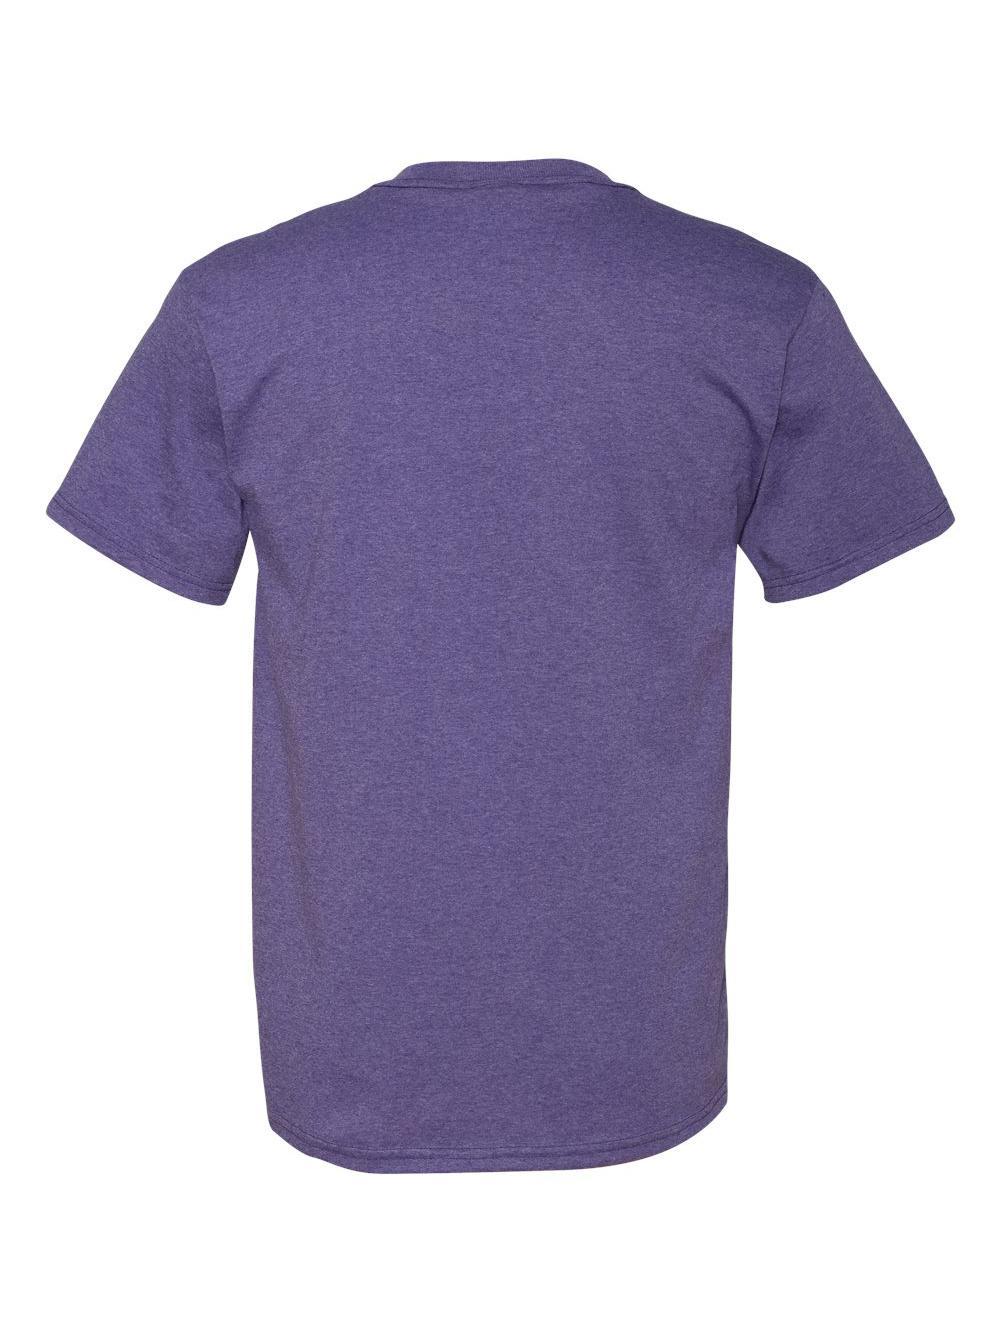 Fruit-of-the-Loom-HD-Cotton-Short-Sleeve-T-Shirt-3930R thumbnail 106